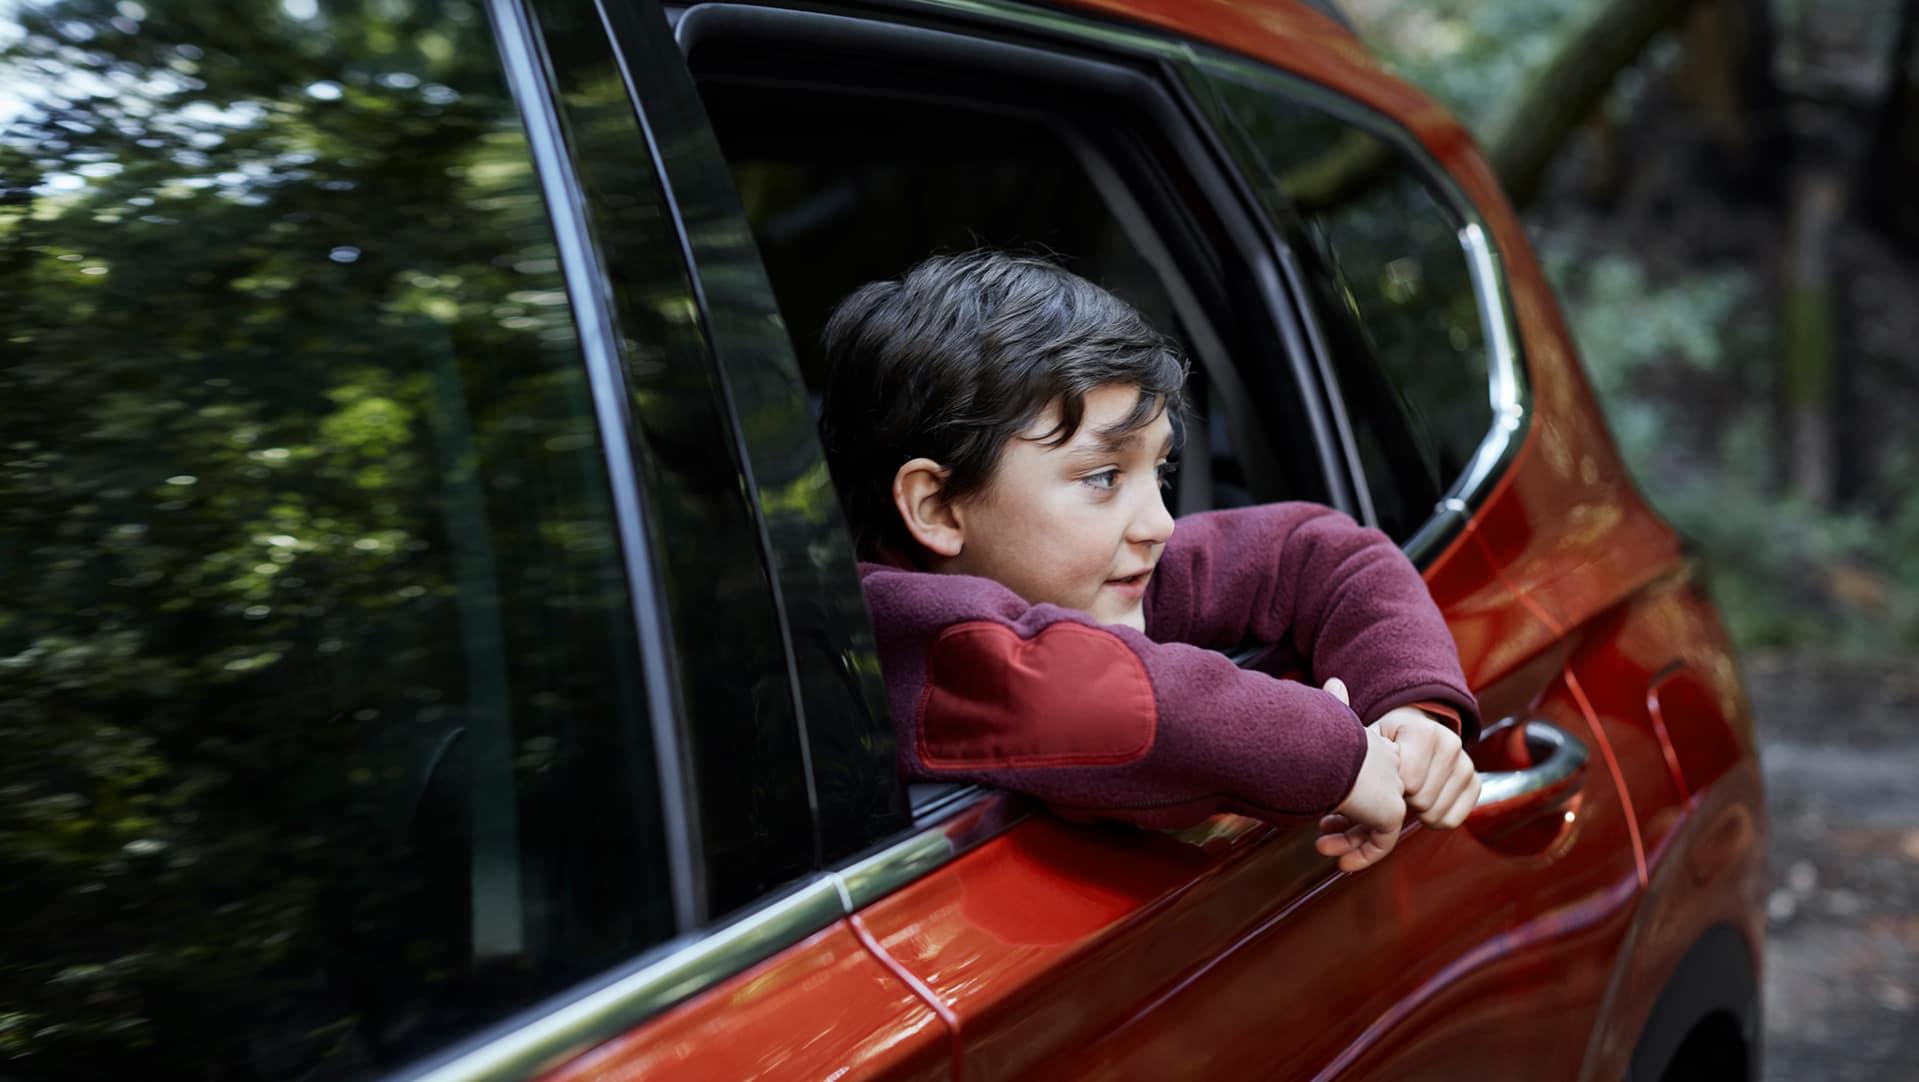 The 2020 Hyundai Santa Fe model features at Boch Hyundai of Norwood MA | Orange MY20 SantaFe Close Up Exterior Kid Window